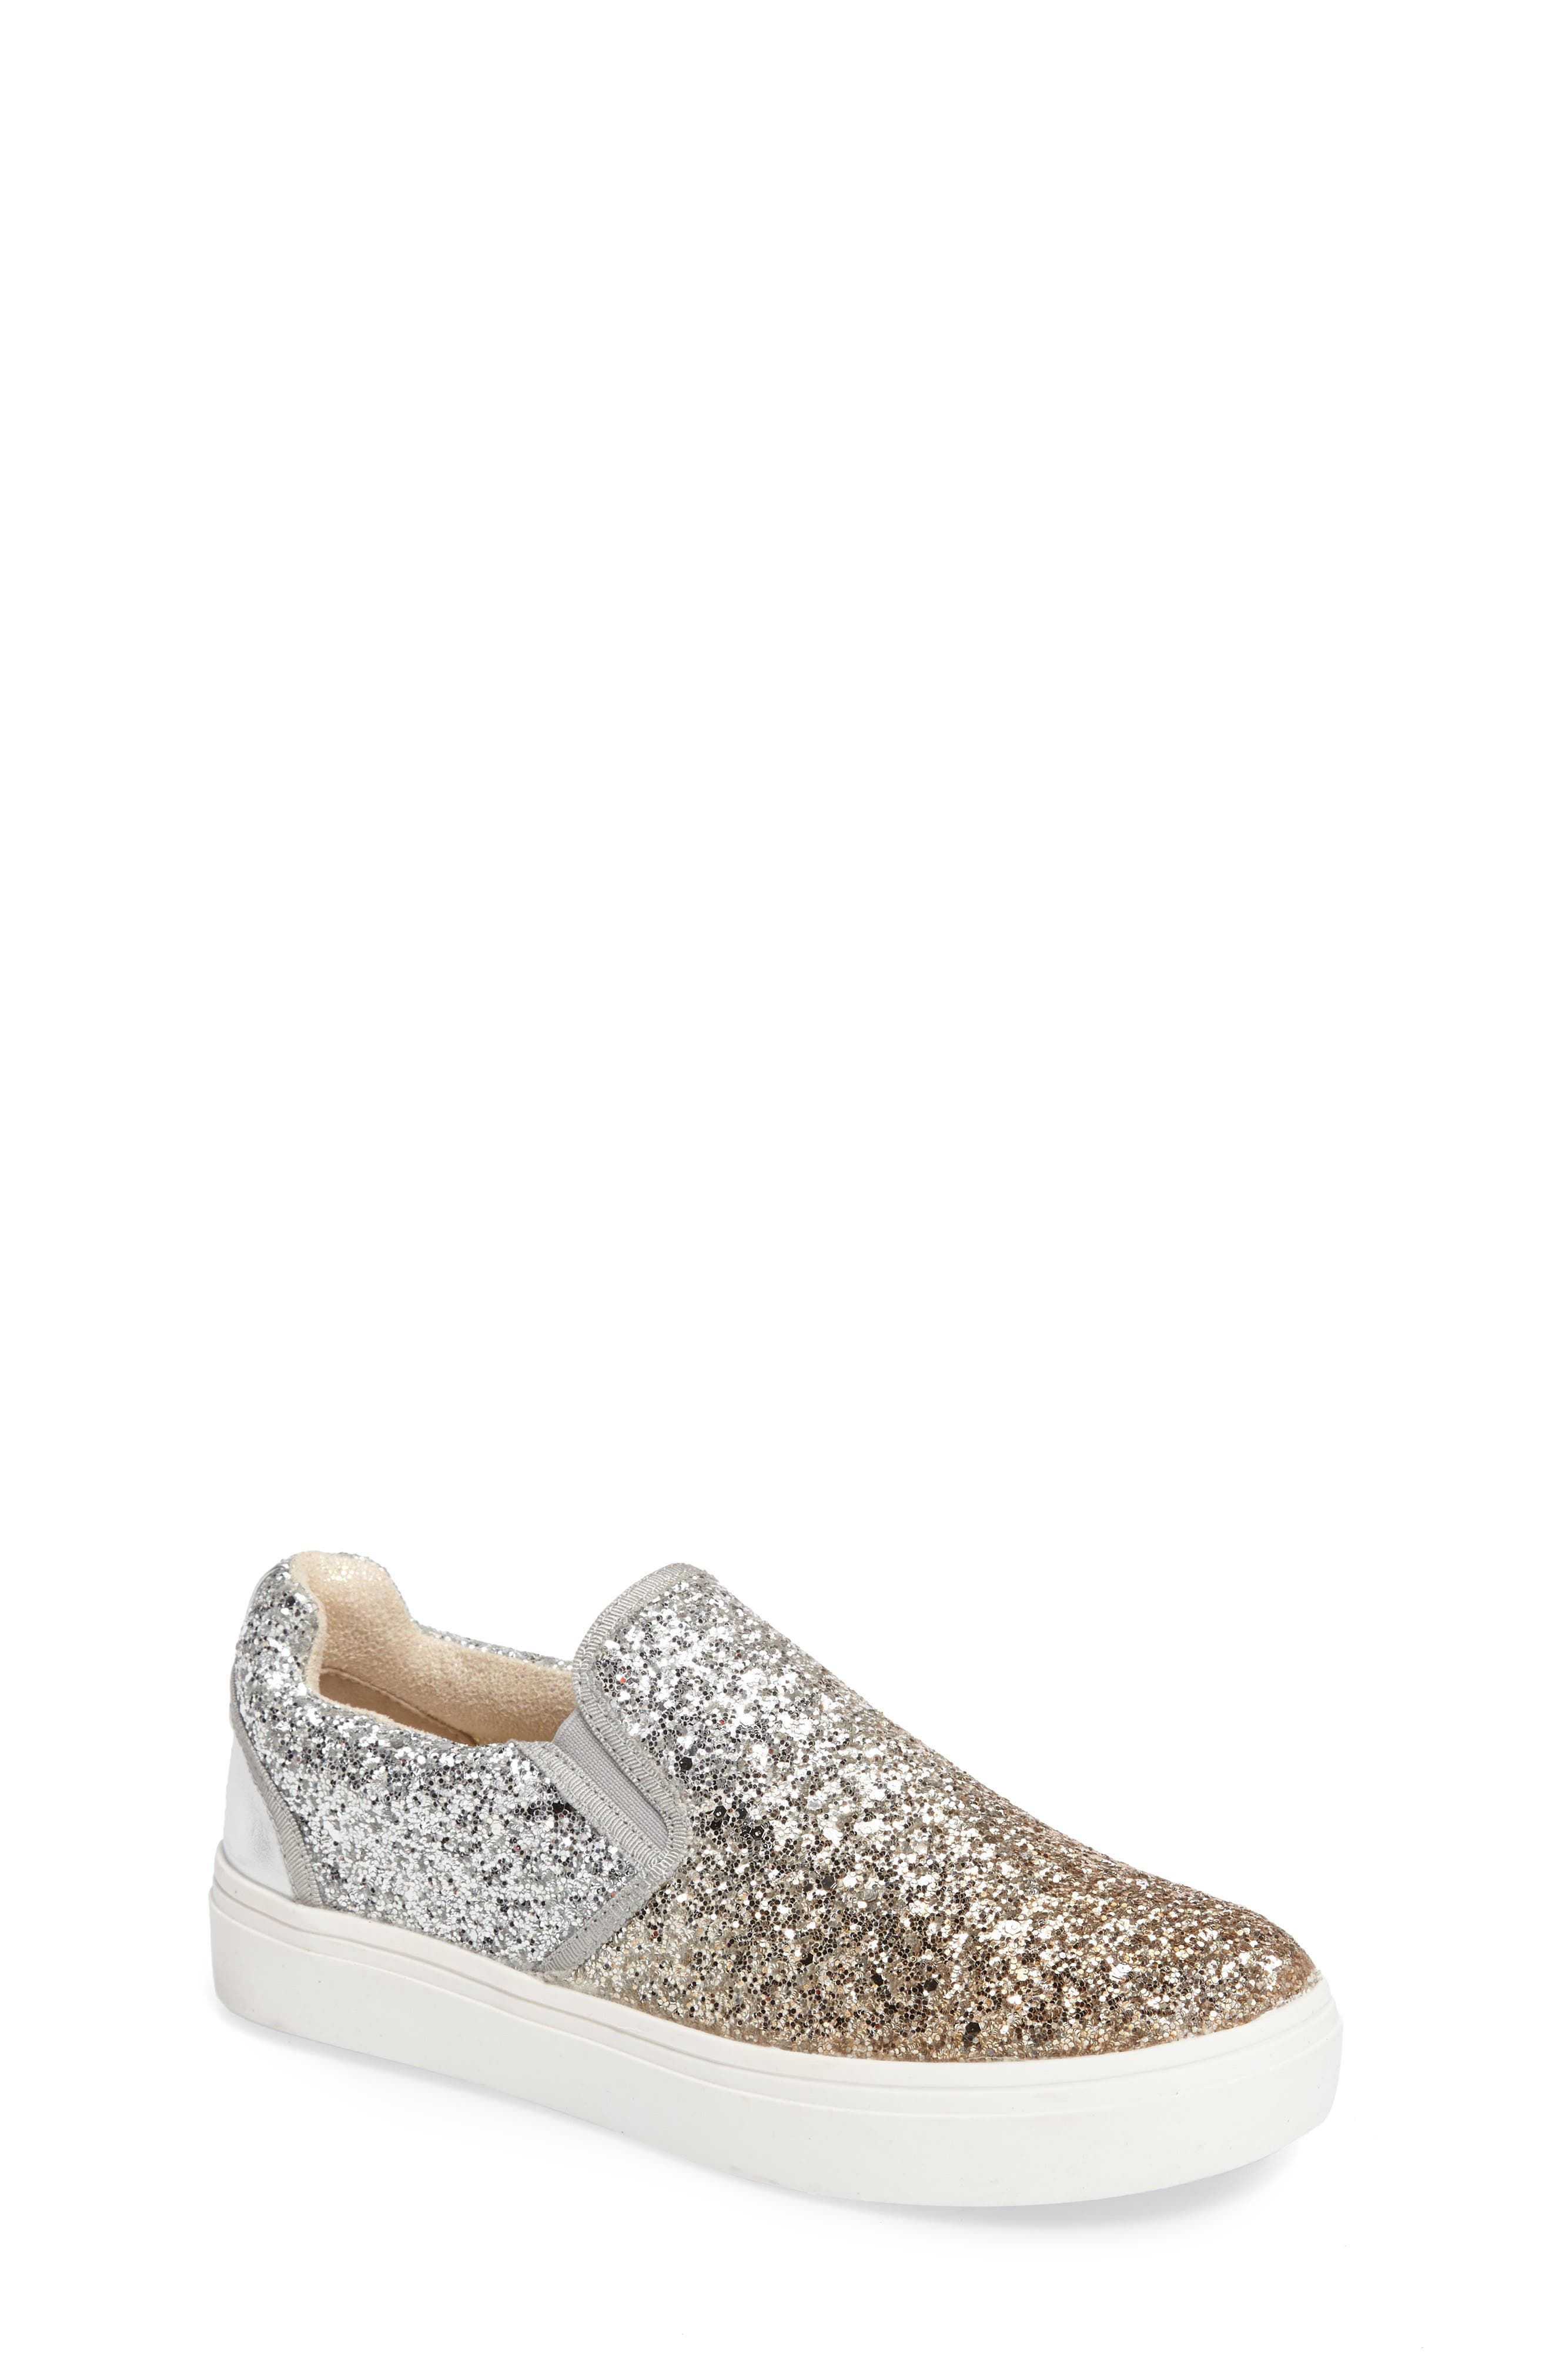 STUART WEITZMAN Double Marcia Glitter Platform Sneaker